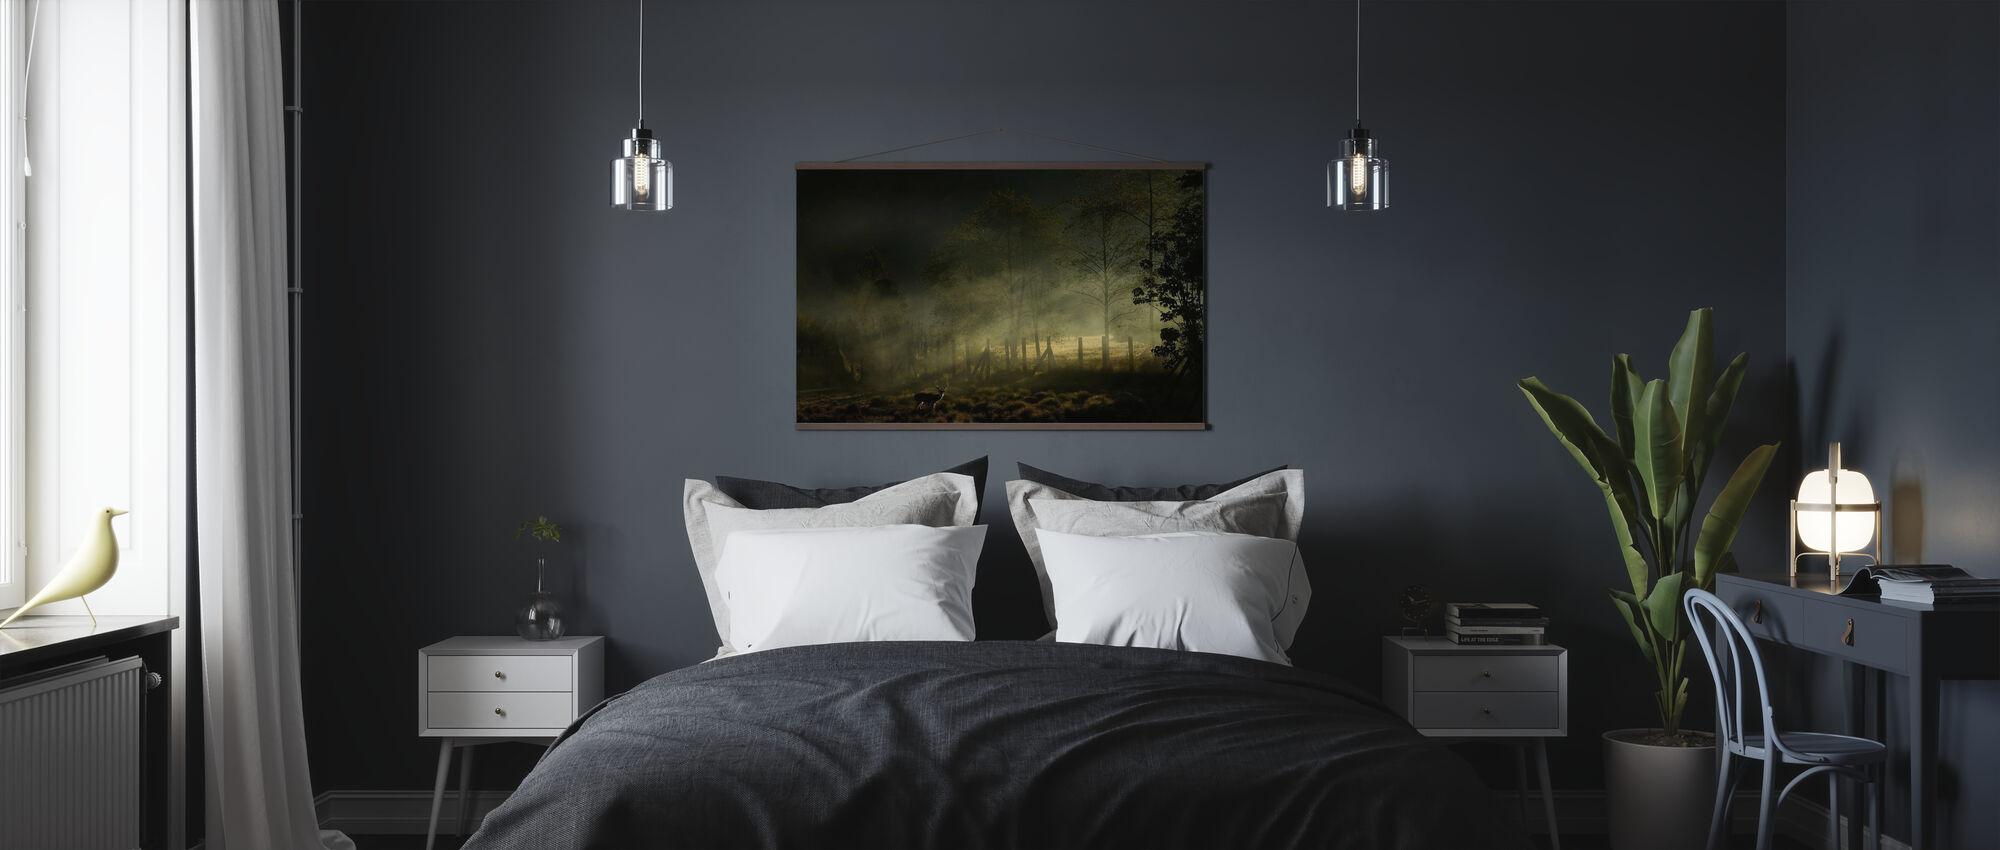 Misty Morning - Poster - Bedroom